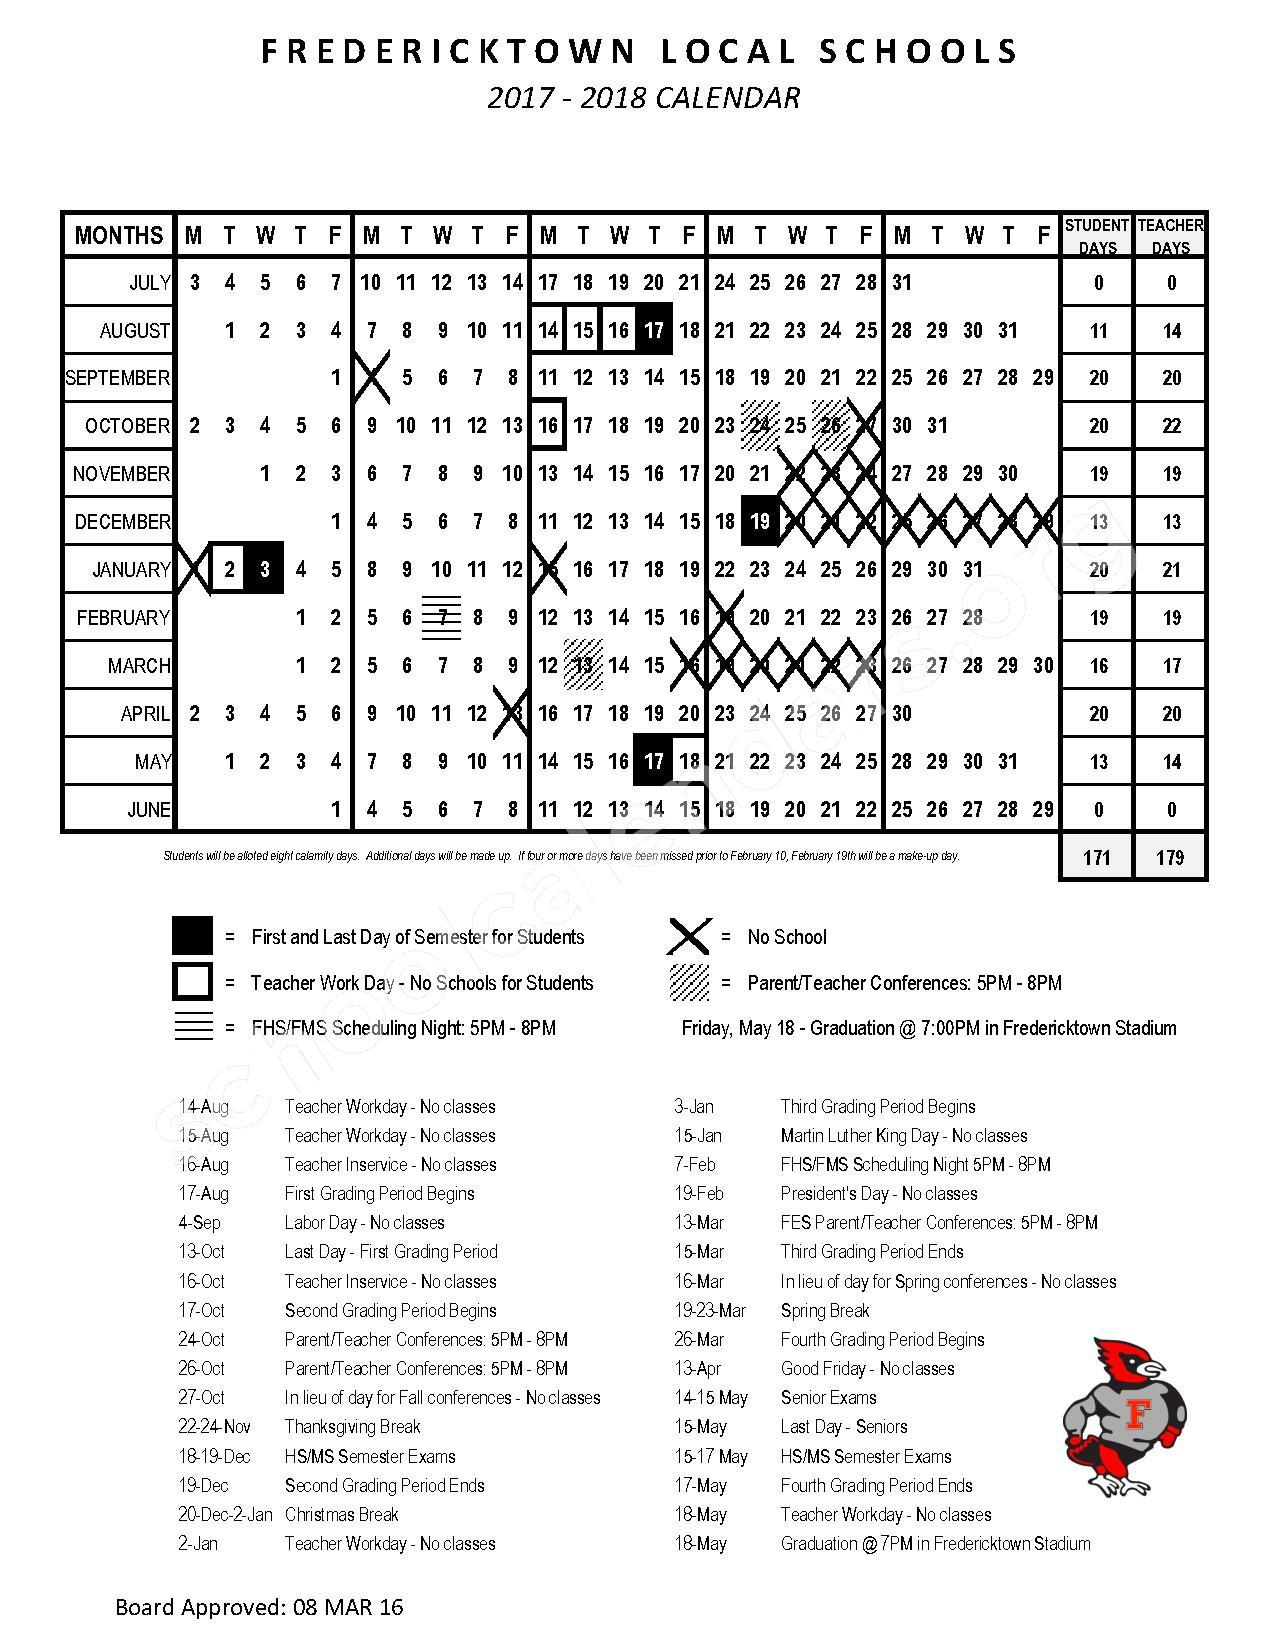 2016 - 2017 School Calendar – Fredericktown Local Schools – page 2